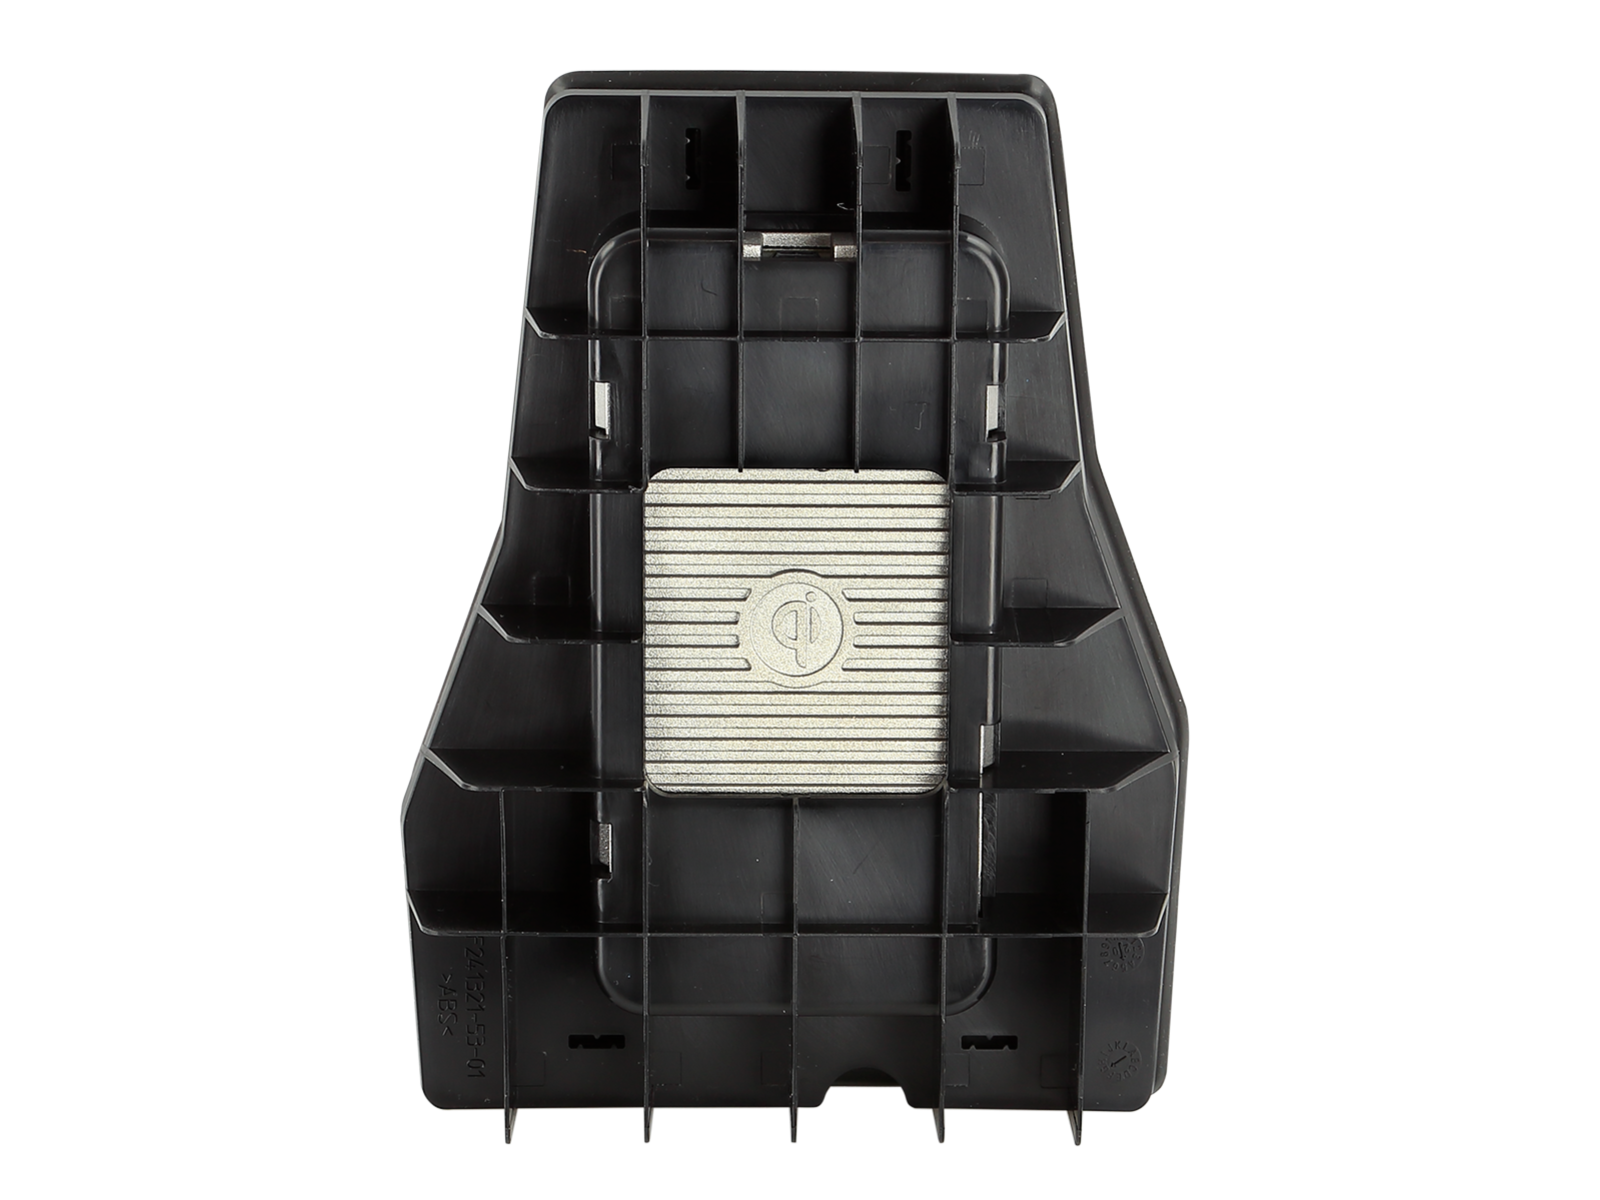 INBAY® Pocket Audi A1/A1 Citycarver 2018/19 - 2021 15W